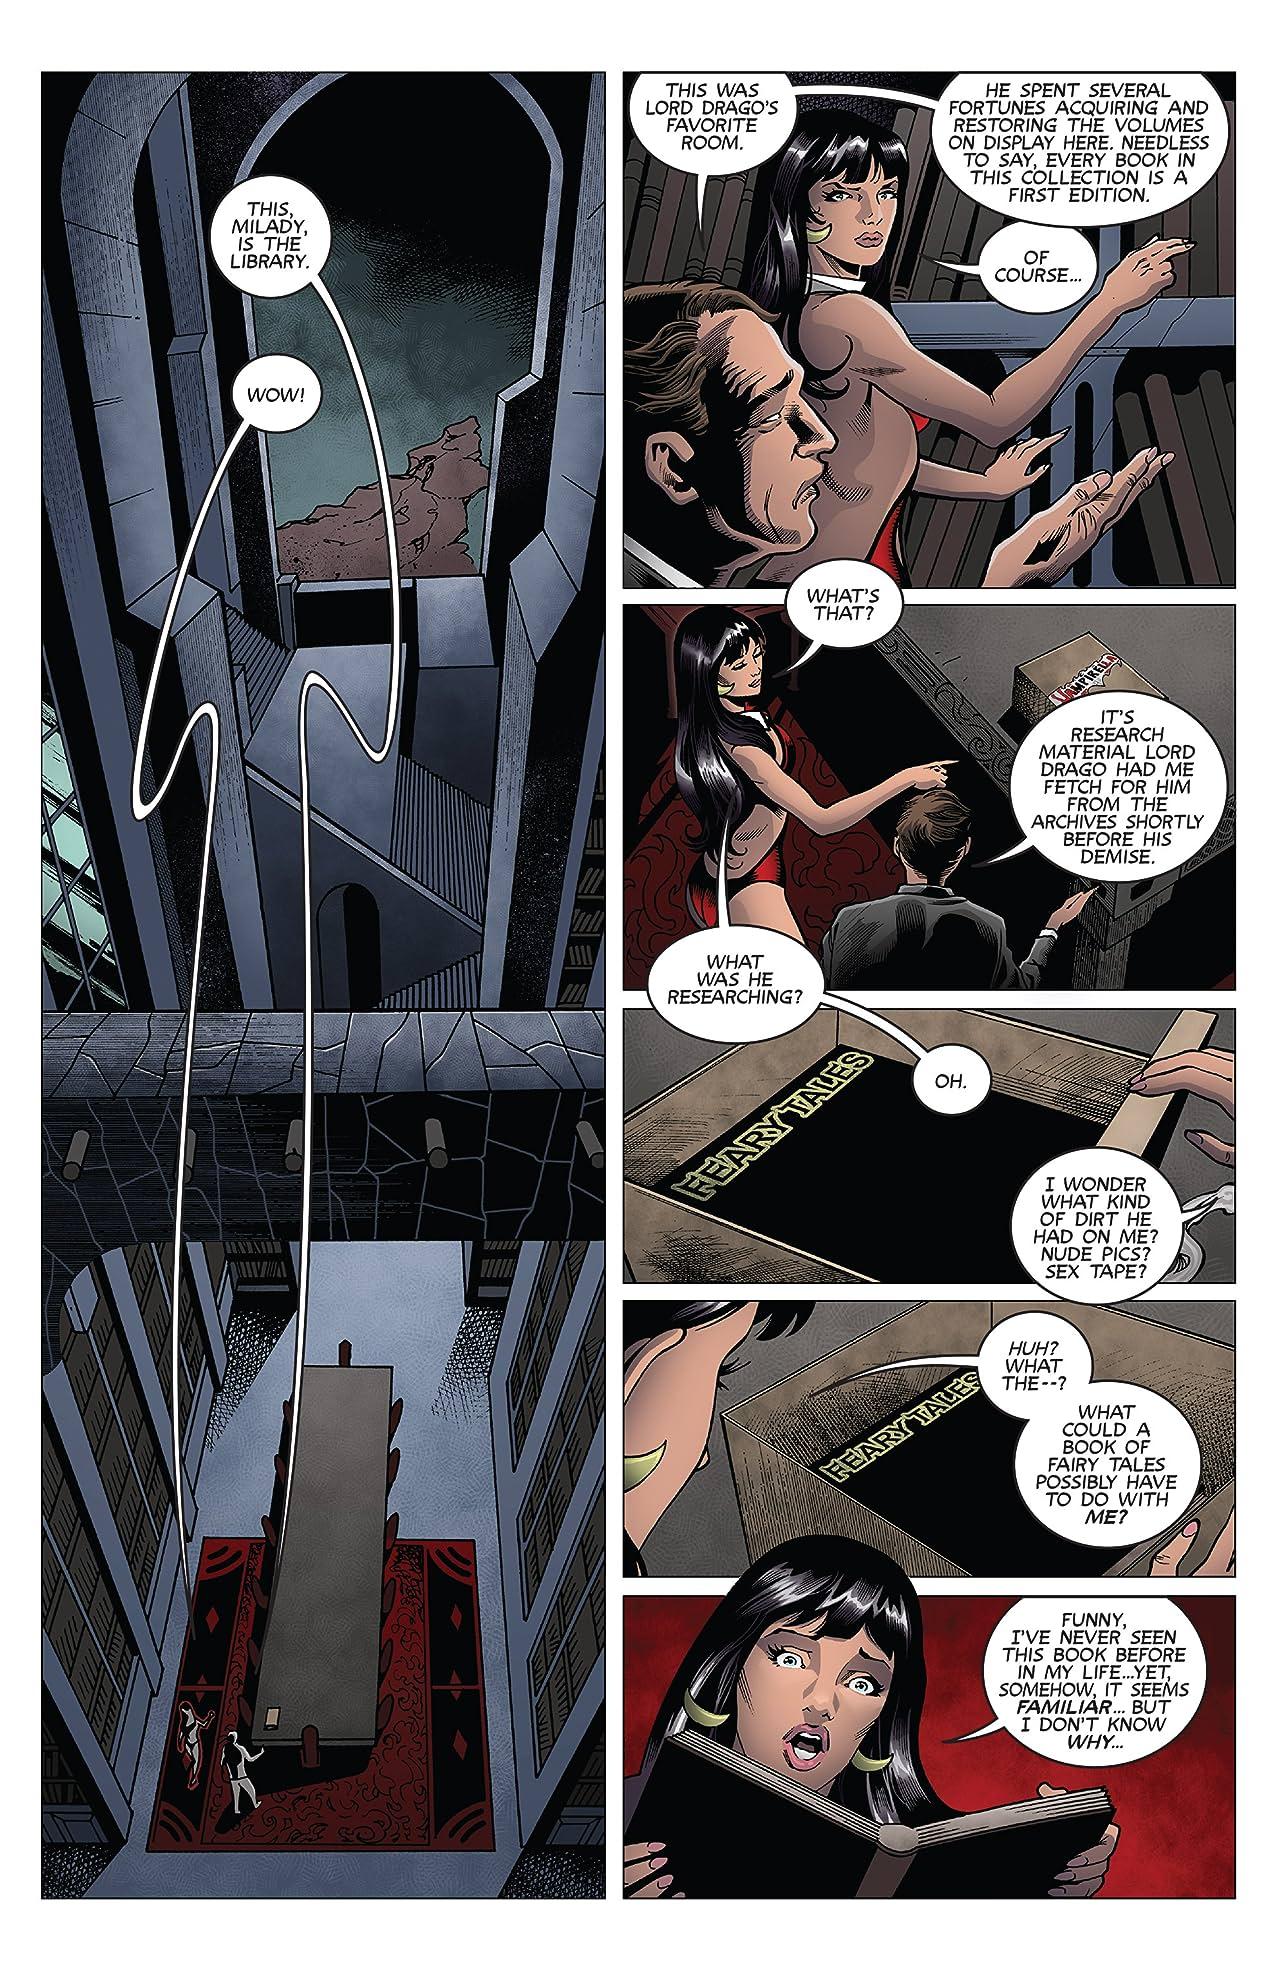 Vampirella: Feary Tales #1 (of 5): Digital Exclusive Edition